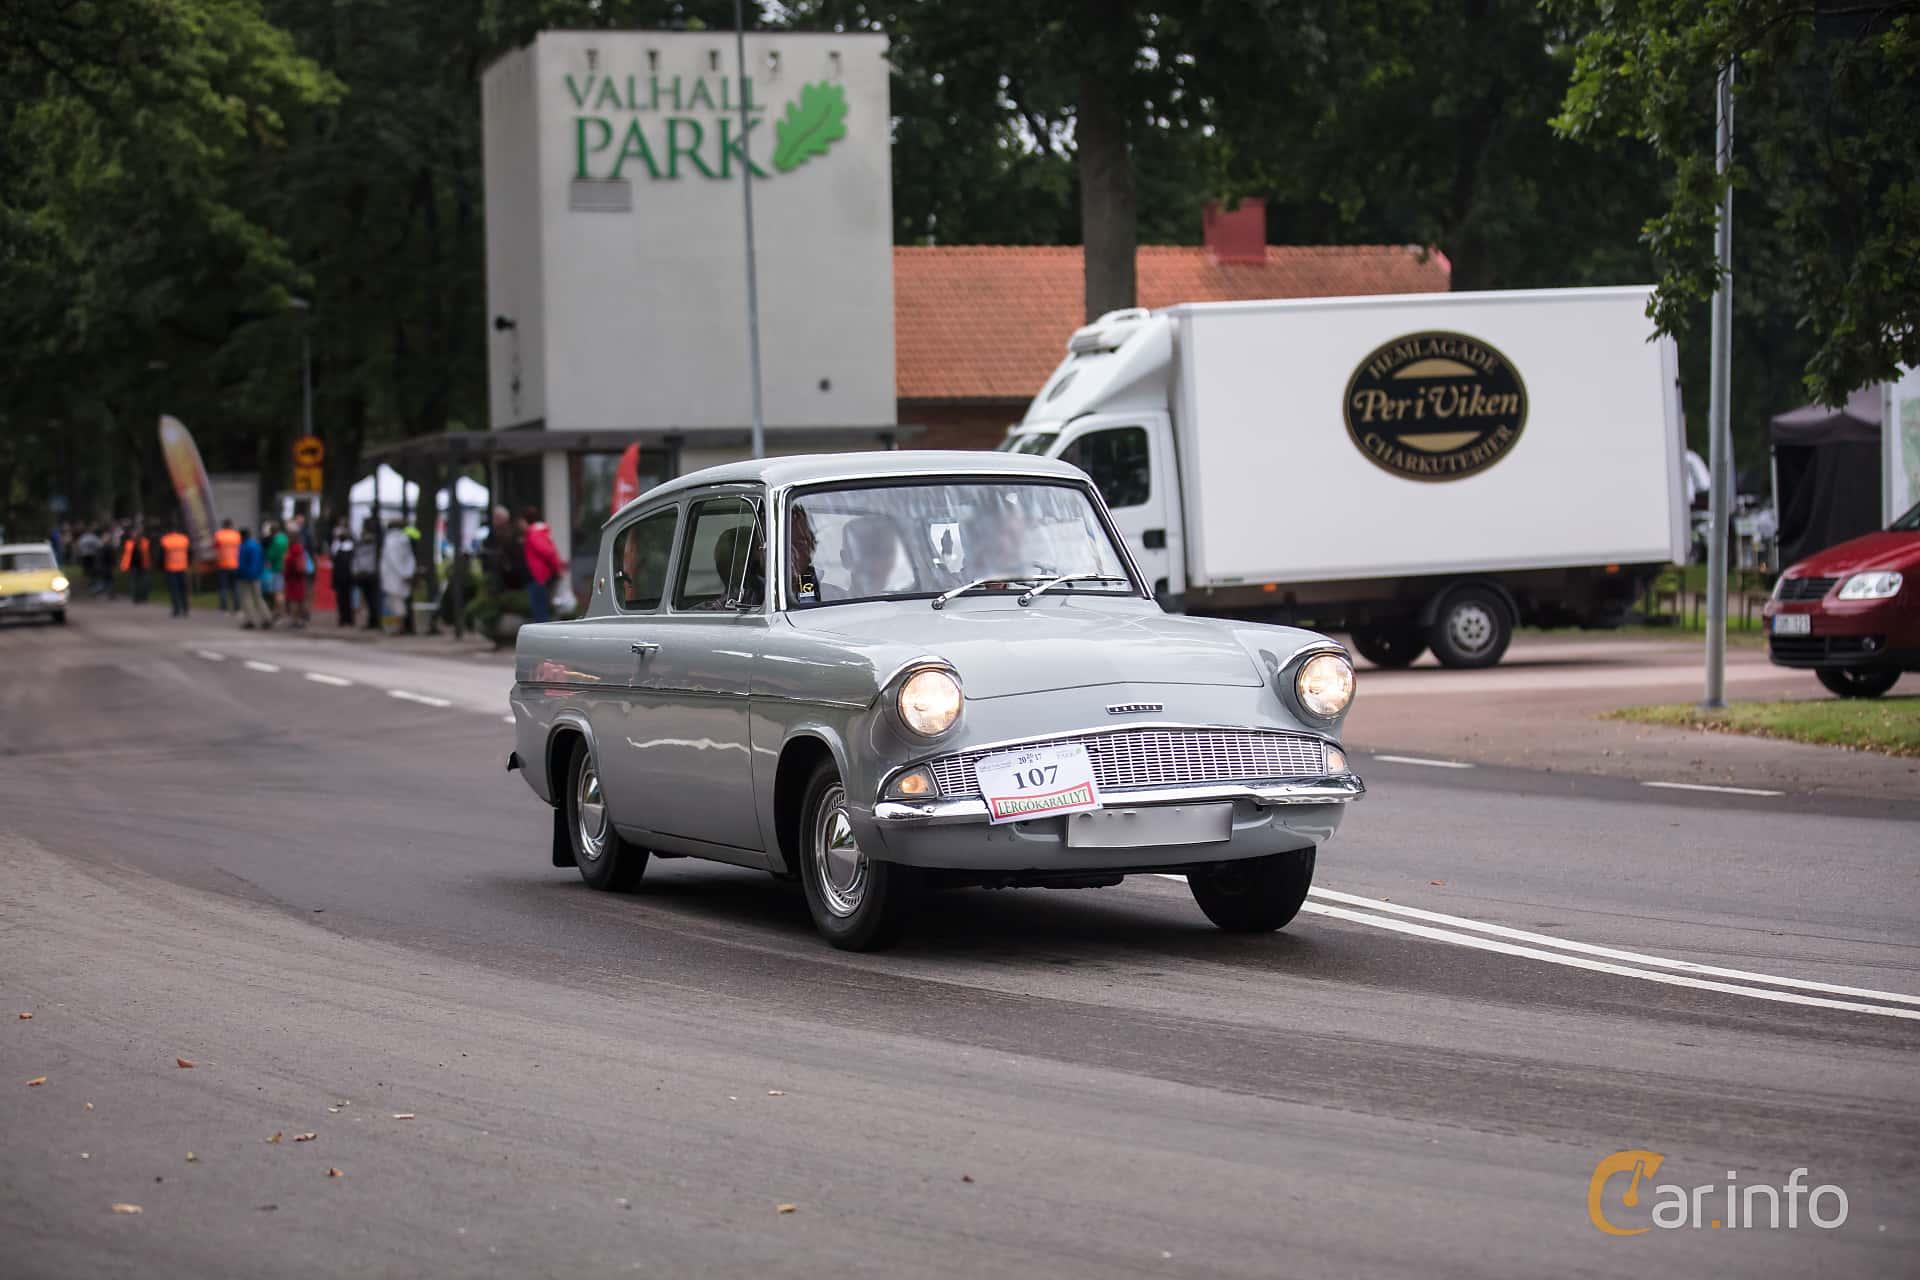 Ford Anglia 1.0 Manual, 39hp, 1960 at Lergökarallyt 2017